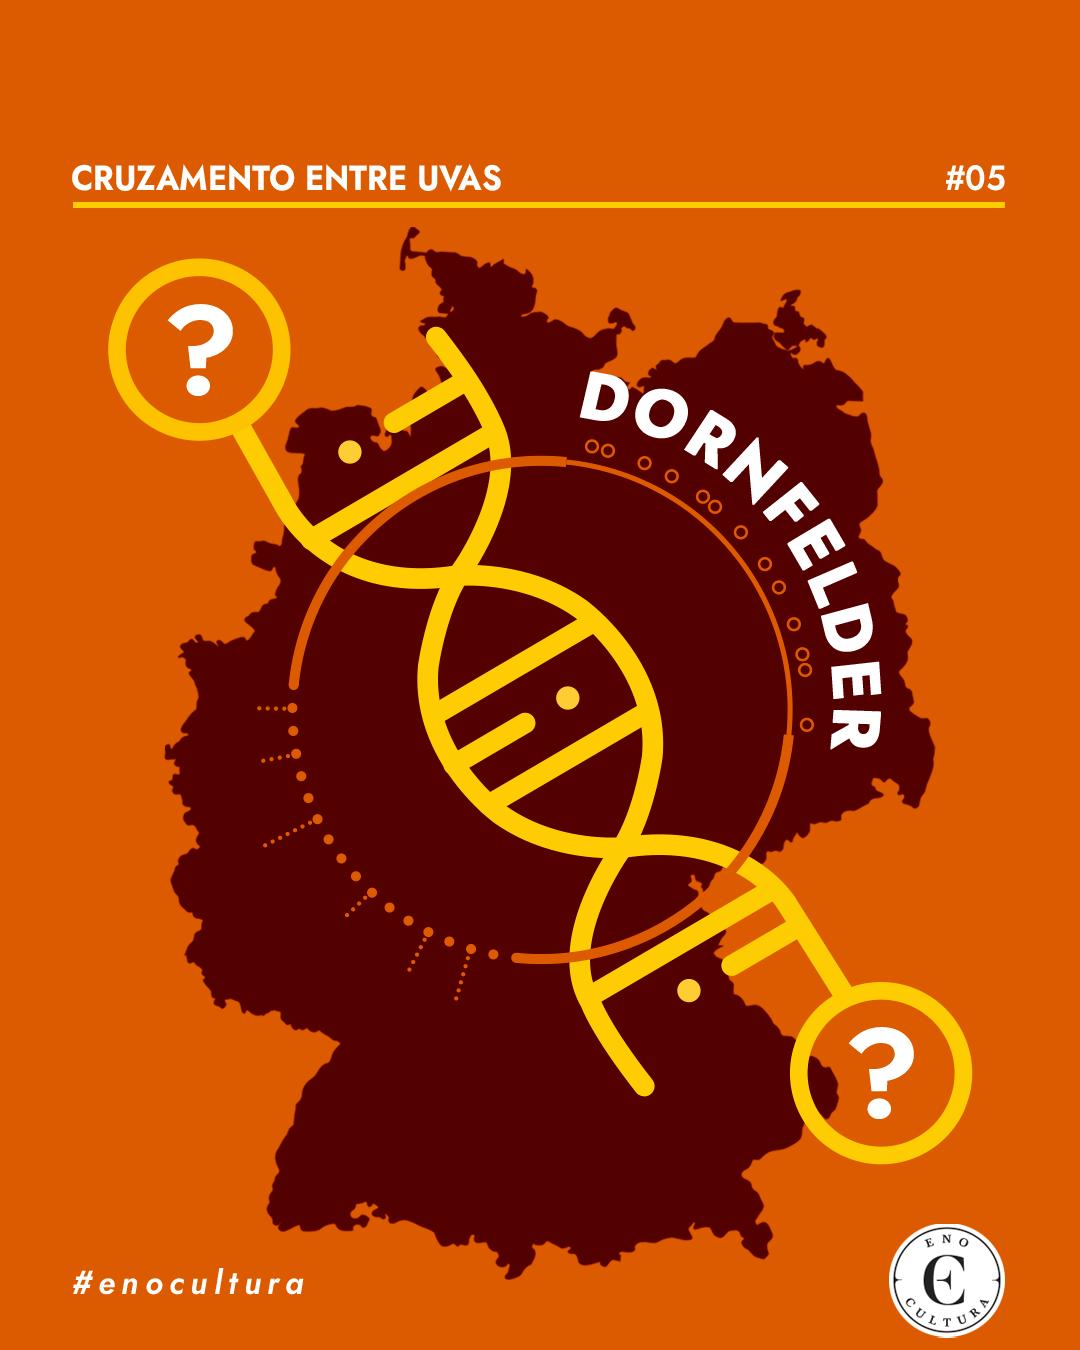 Cruzamento entre Uvas: Dornfelder